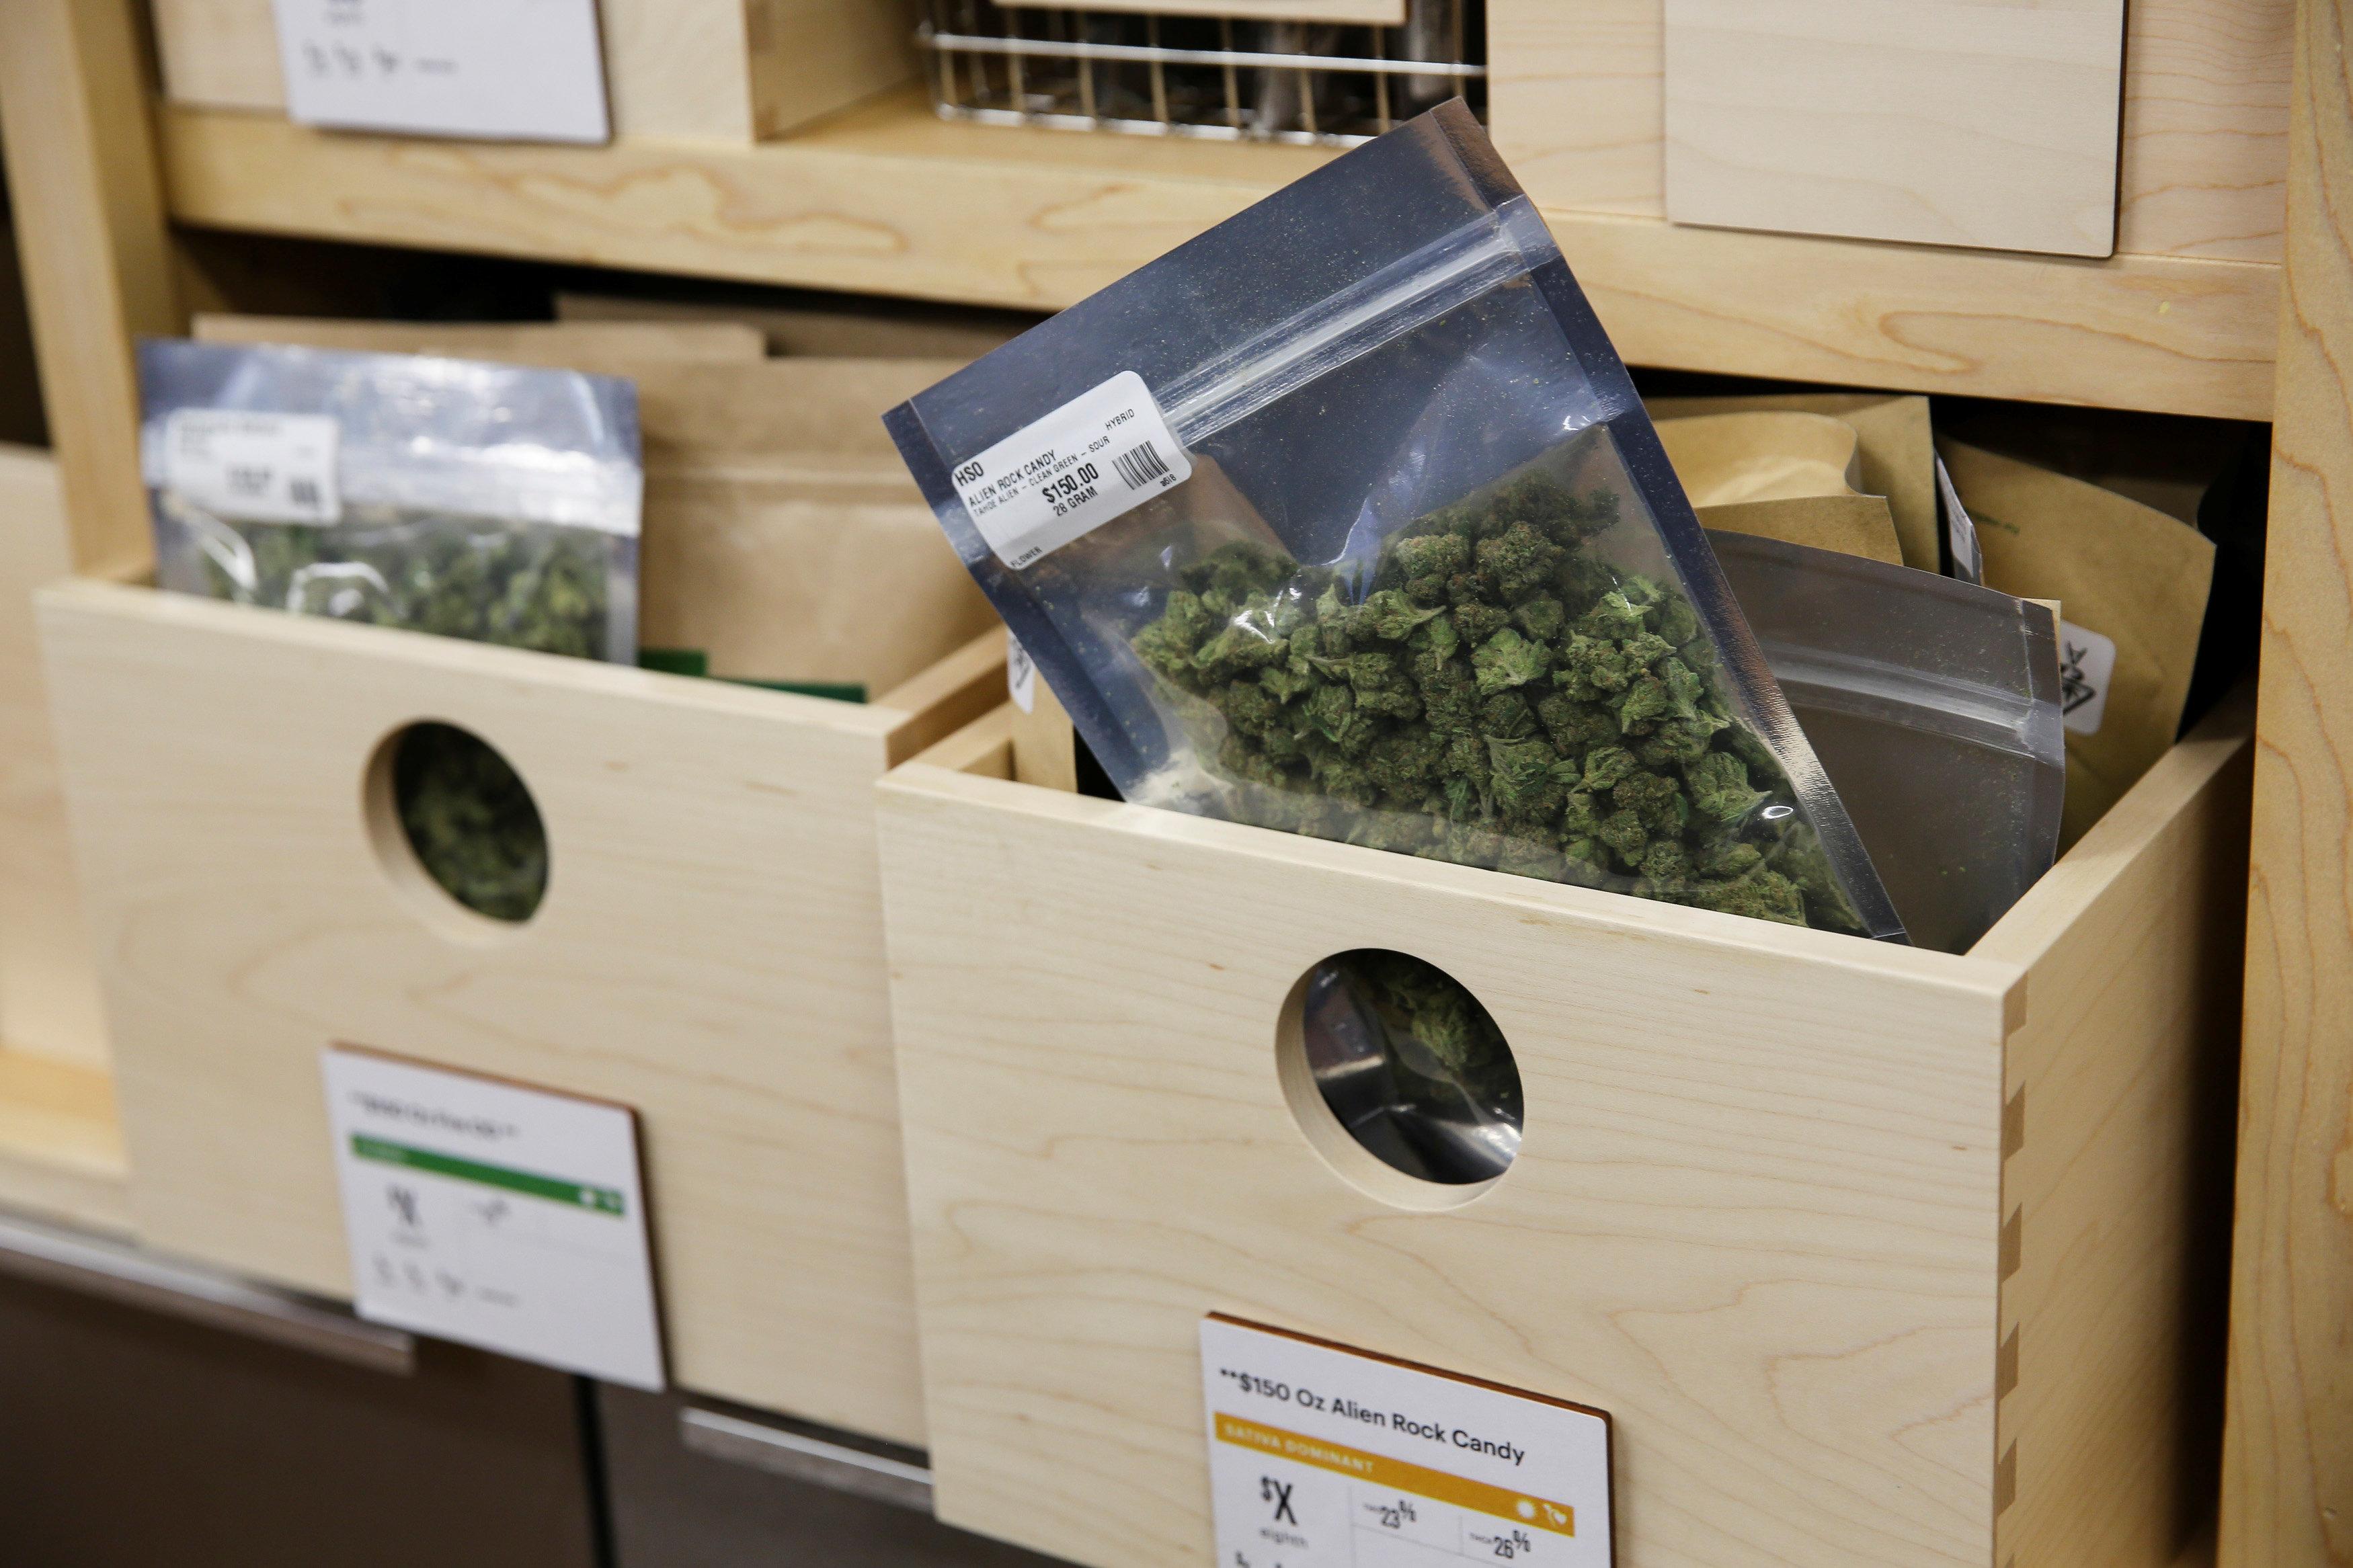 Marijuana is seen for sale at Harborside, one of California's largest and oldest dispensaries of medical marijuana, in Oaklan